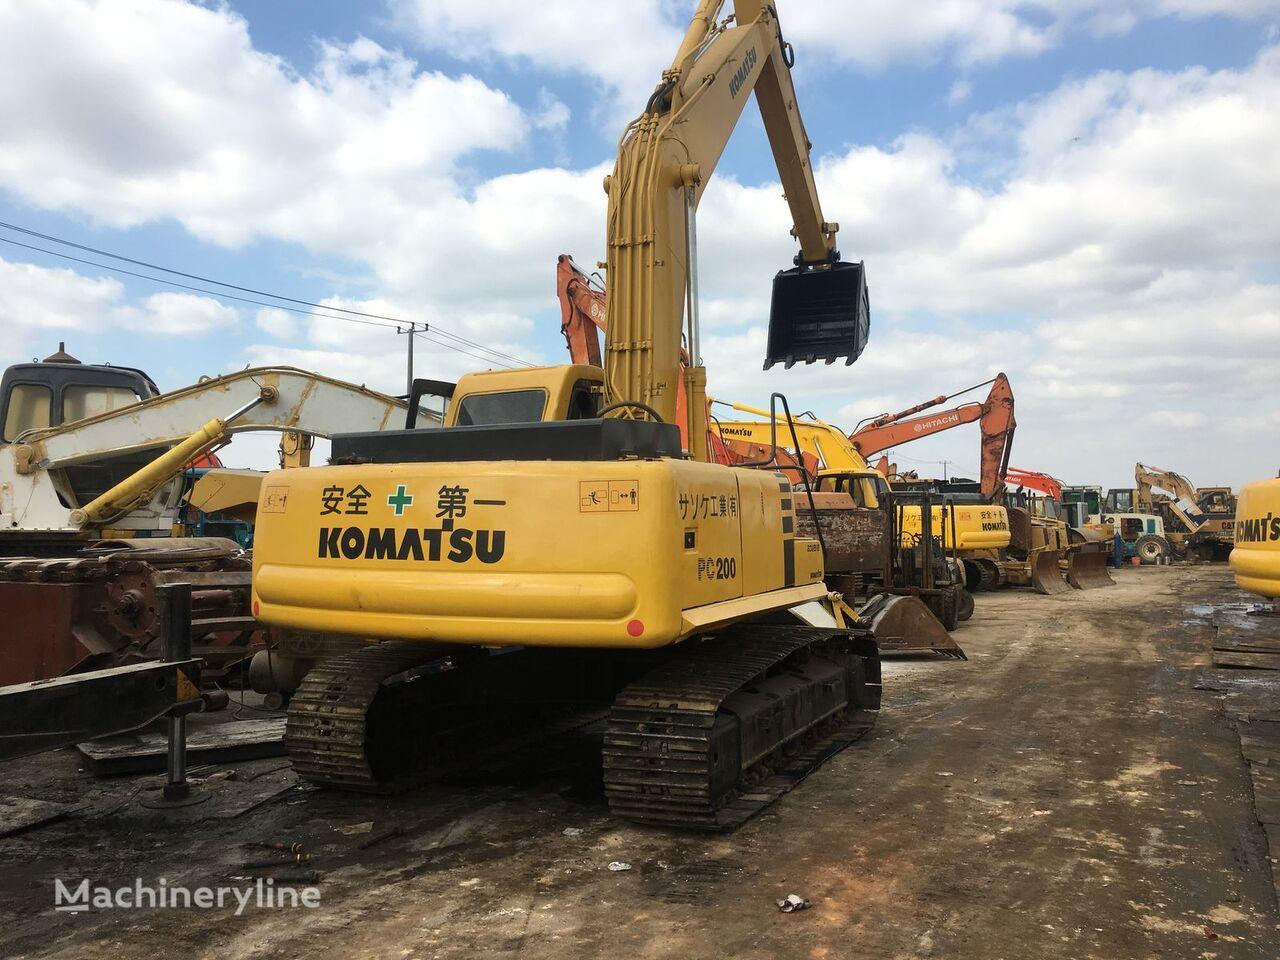 KOMATSU PC200 tracked excavator